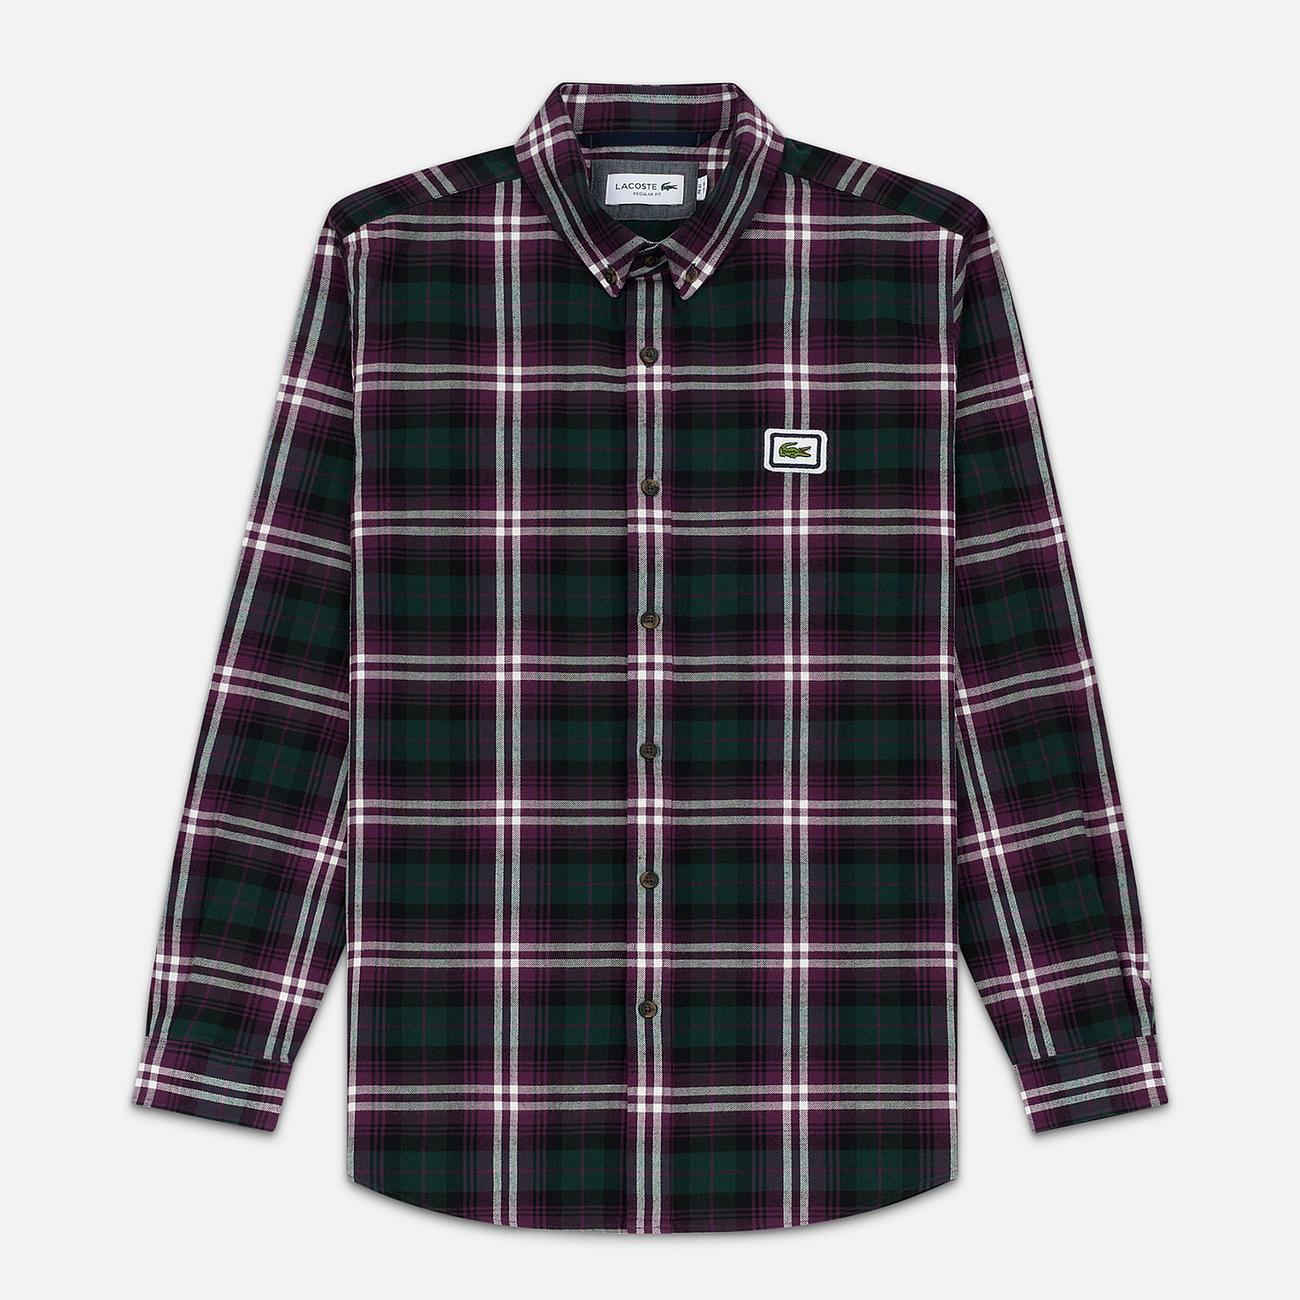 Мужская рубашка Lacoste Regular Fit Check Flannel Bordeaux/White